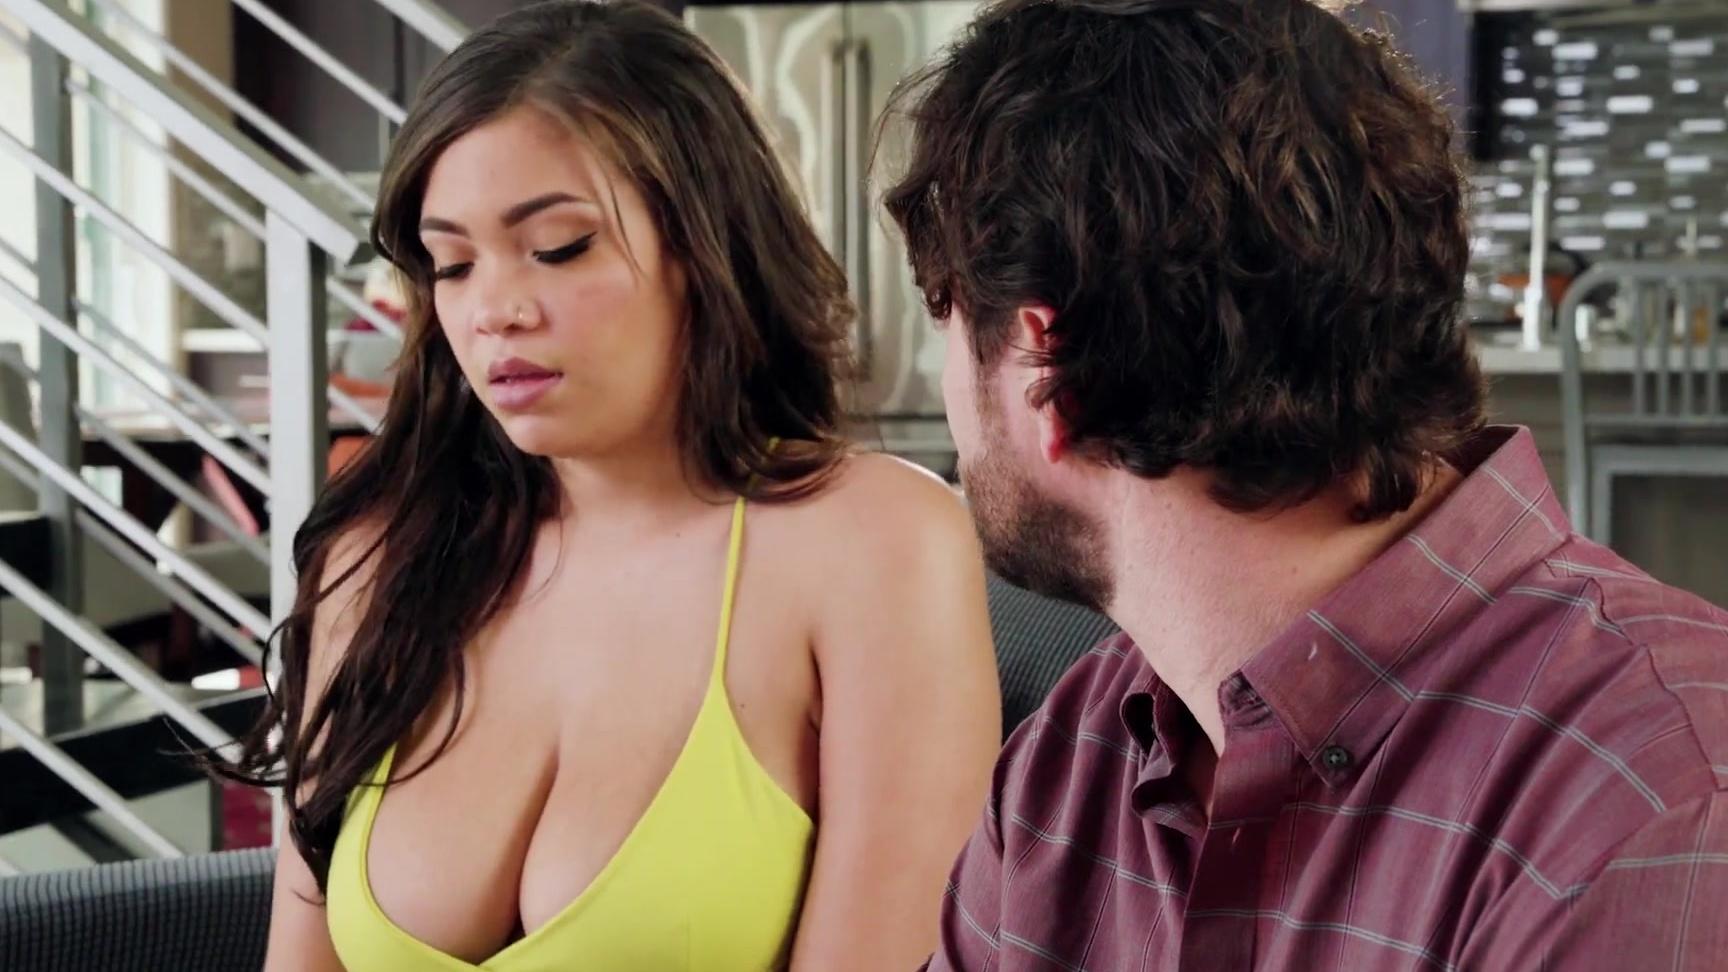 natural huge tits latina fucked & cum showeredmom's ex bf